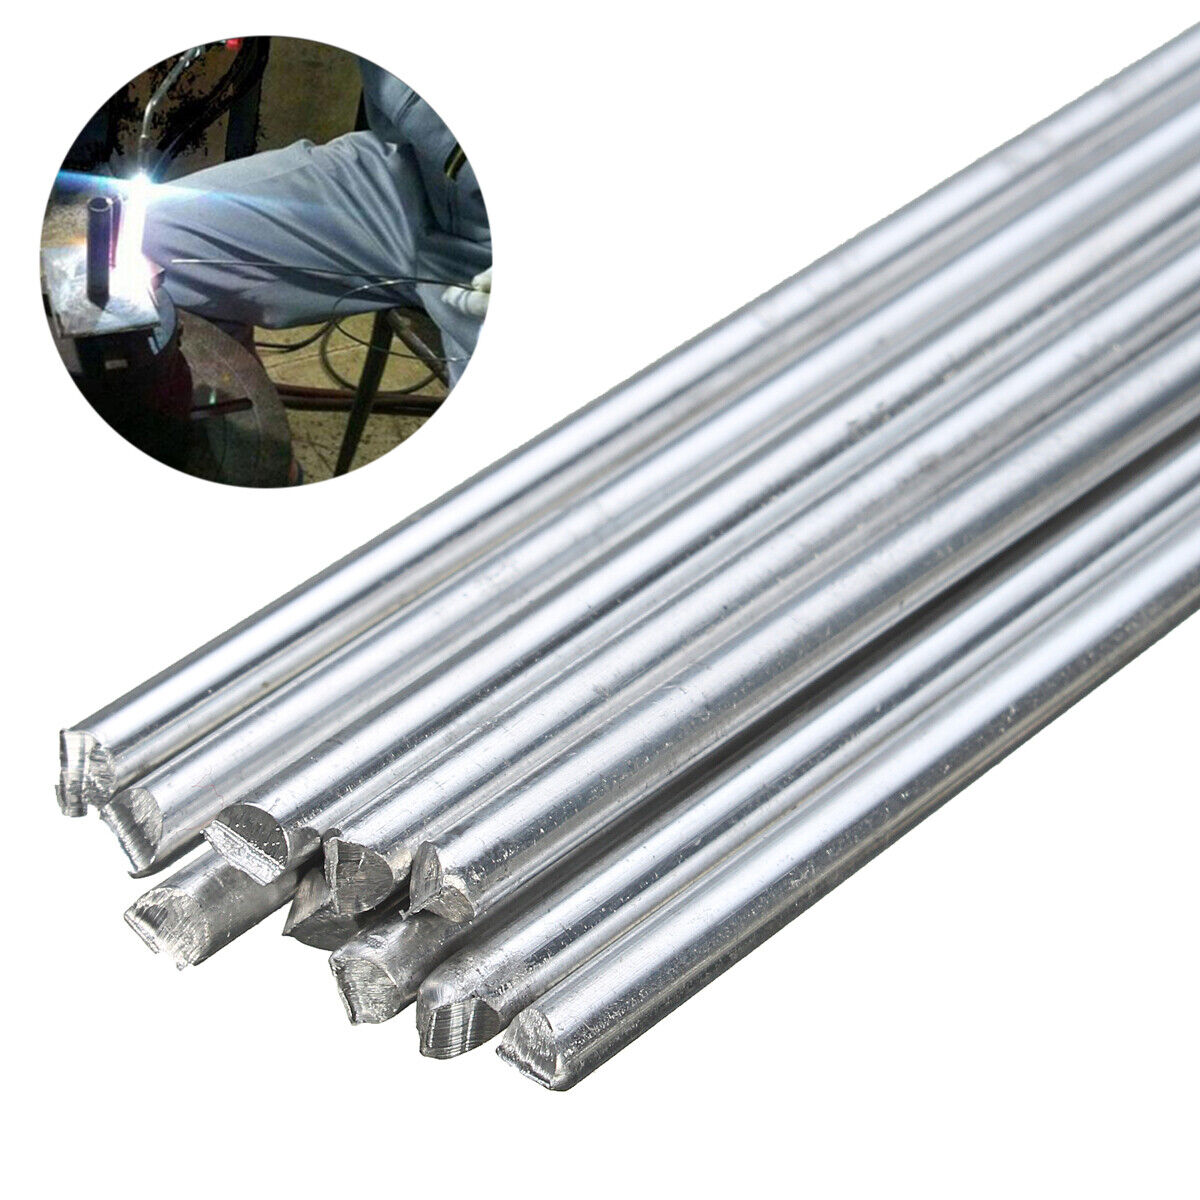 10pcs 2mmx450 mm Niedriger Temperatur Aluminium Schweißstäbe Schweißdraht Set DE